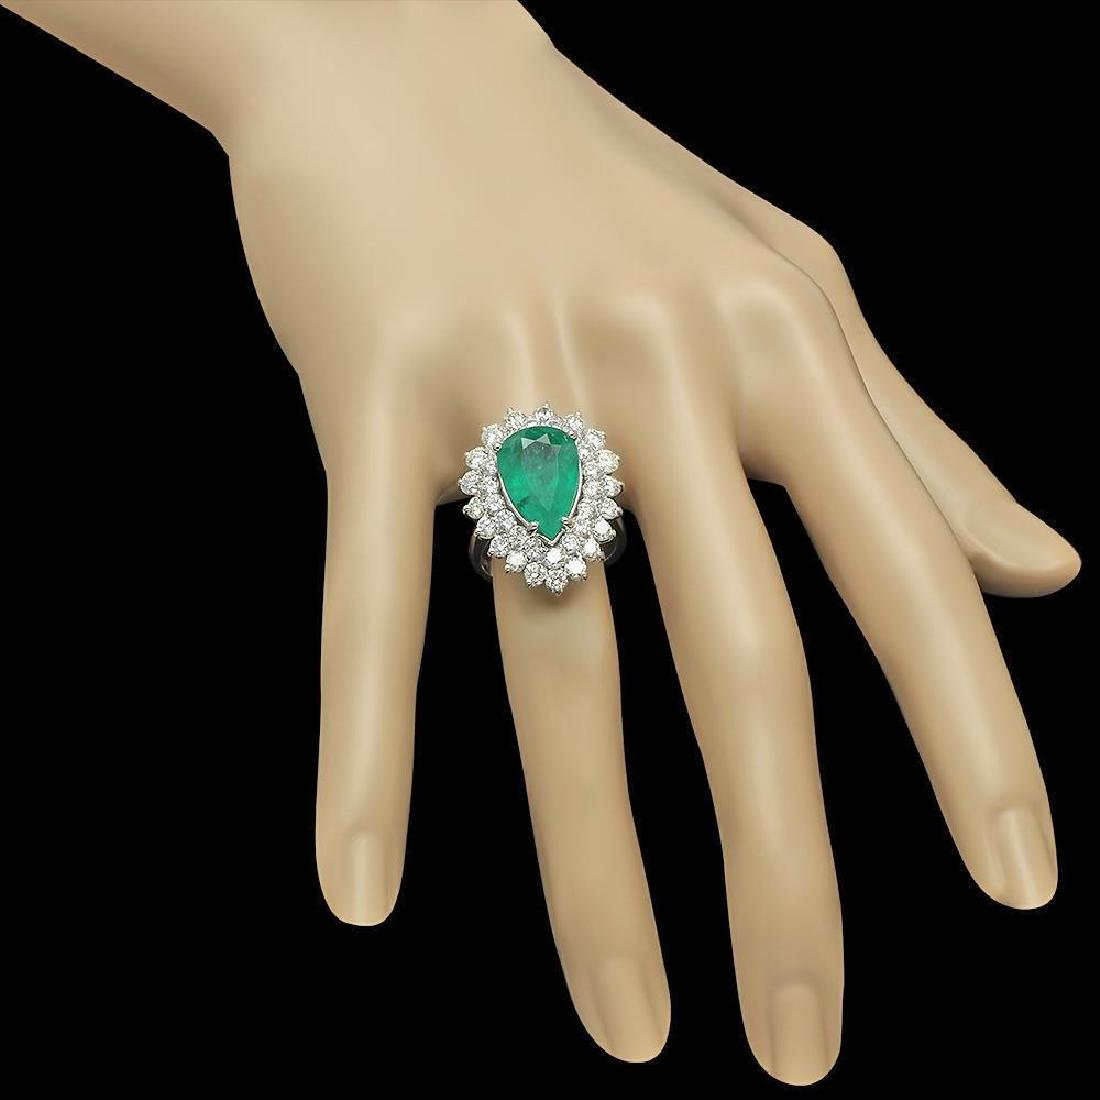 14K Gold 5.12ct Emerald & 2.75ct Diamond Ring - 3